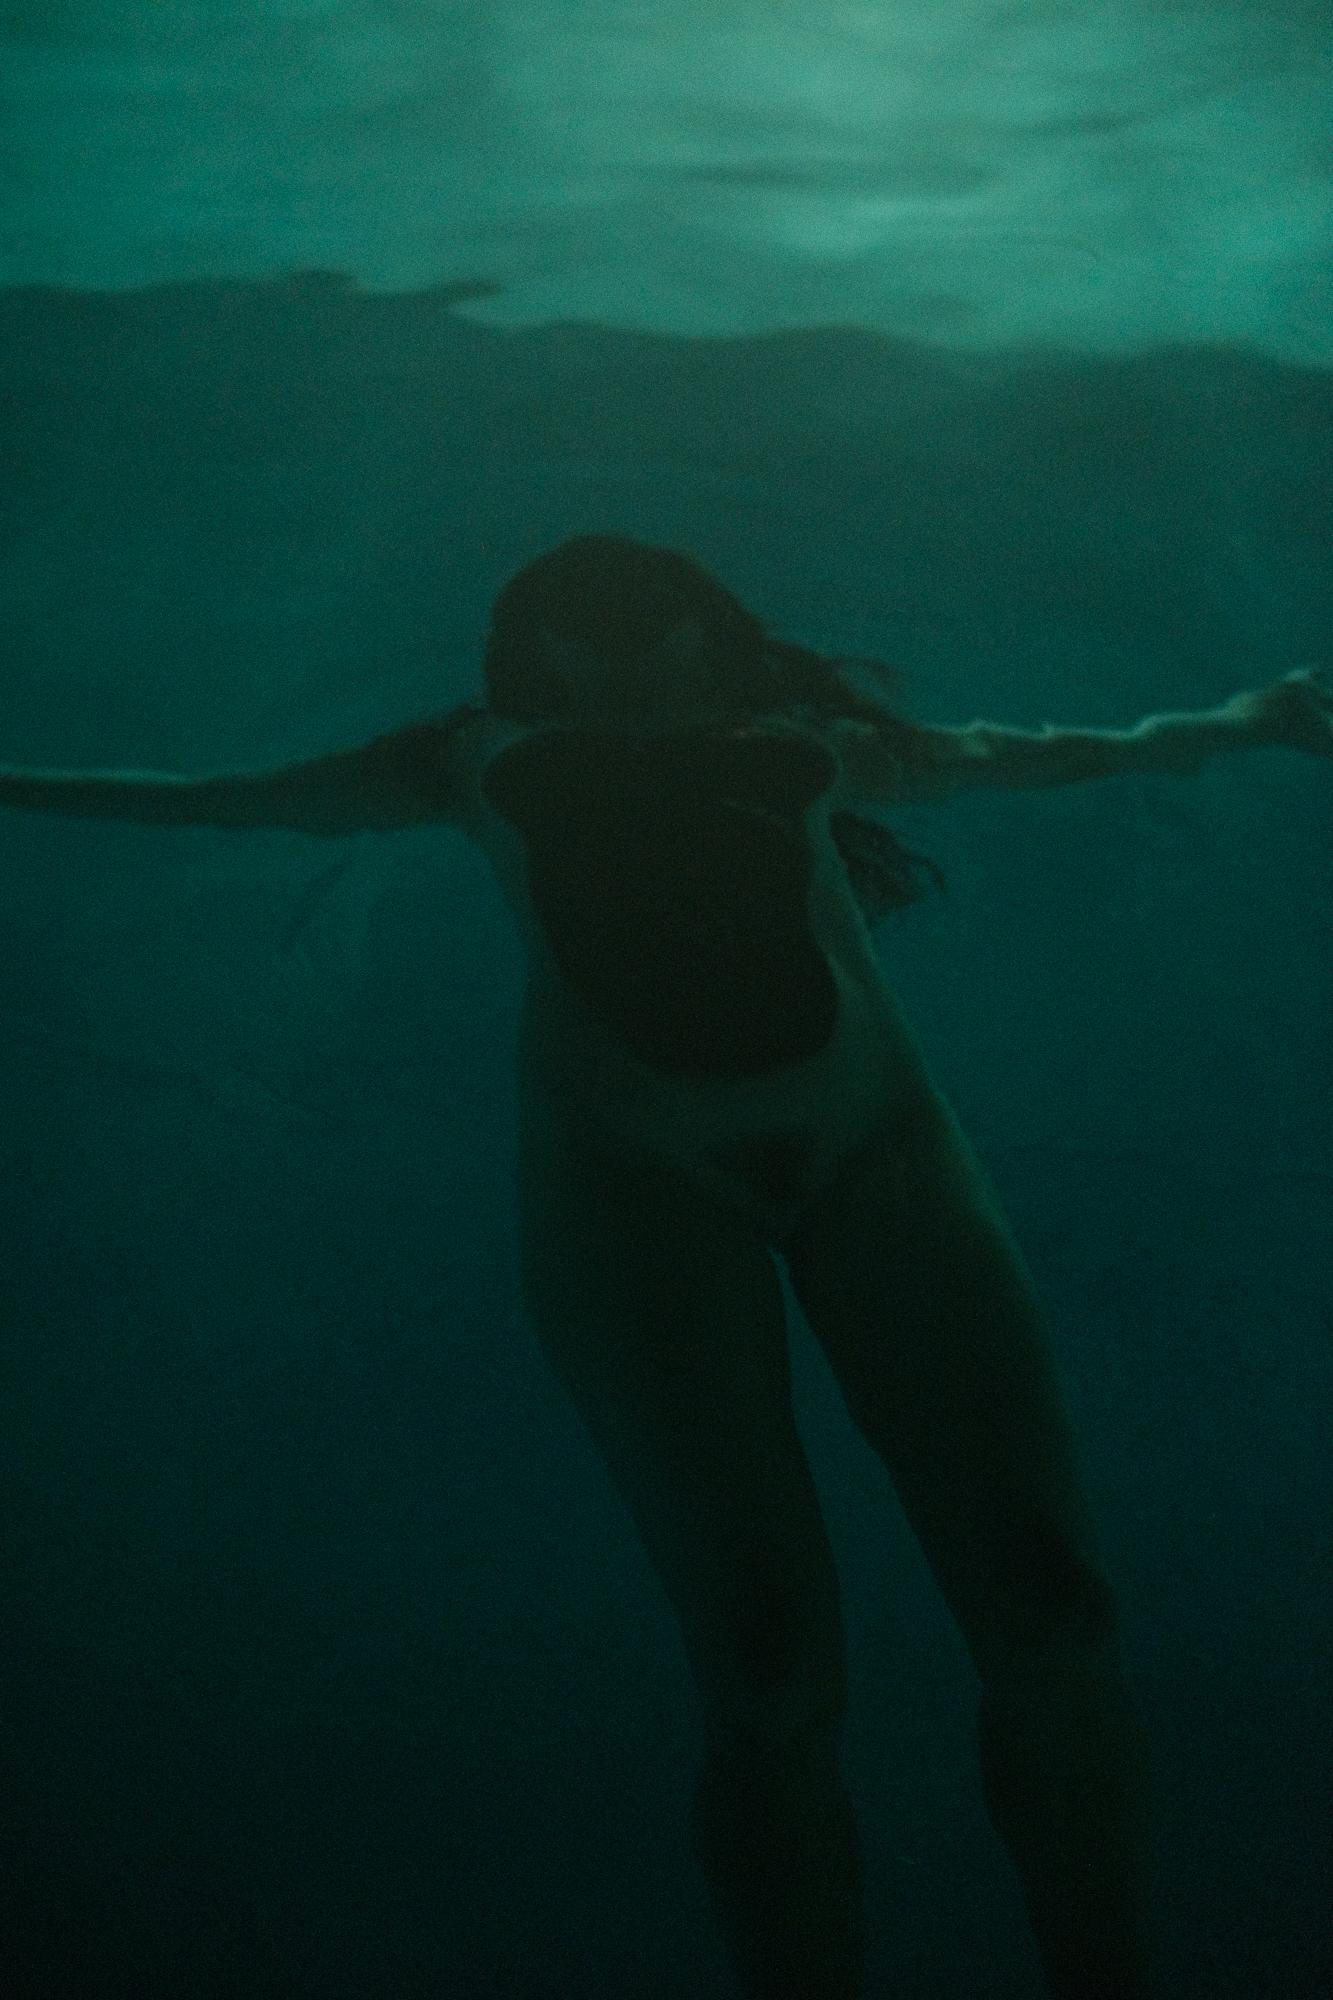 20170619-Ariane-Cassidy-Hannah-swimming-pool-X-Pro2-0323-Edit.jpg